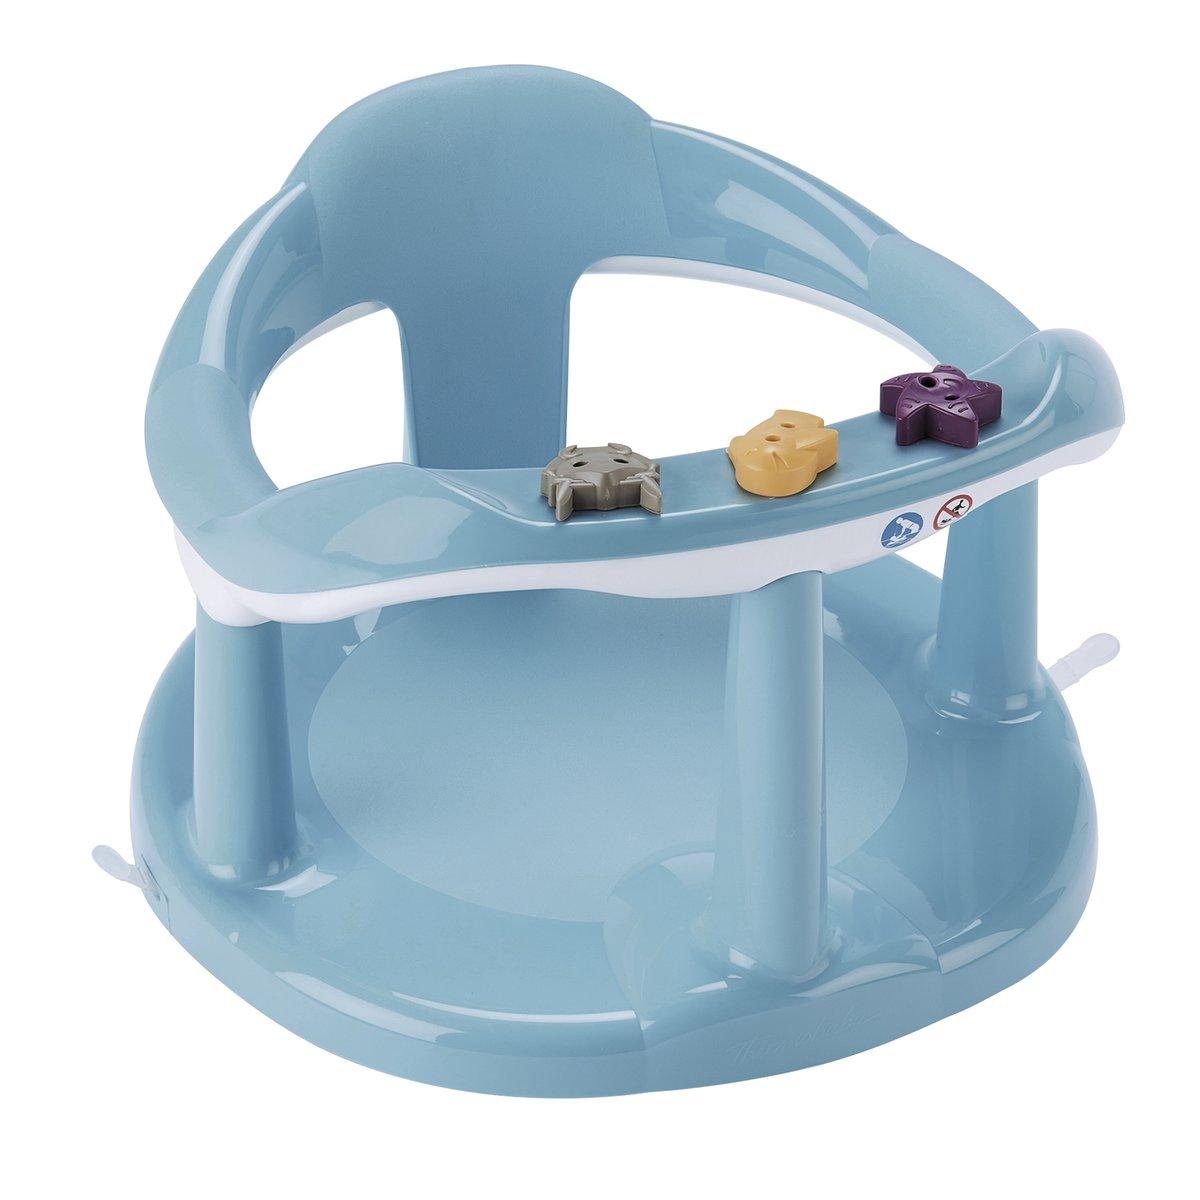 Thermobaby Aquababy Cornflower Blue vannu krēsliņš